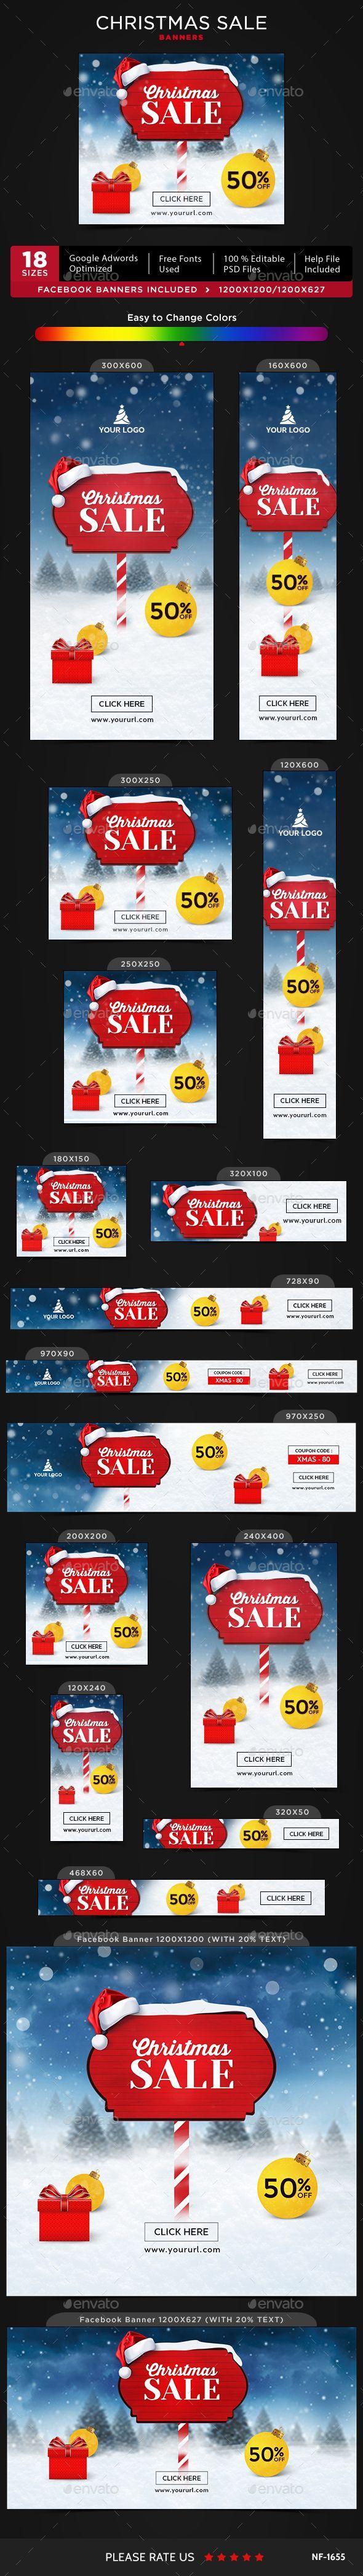 Christmas Banners Template PSD #ads #xmas